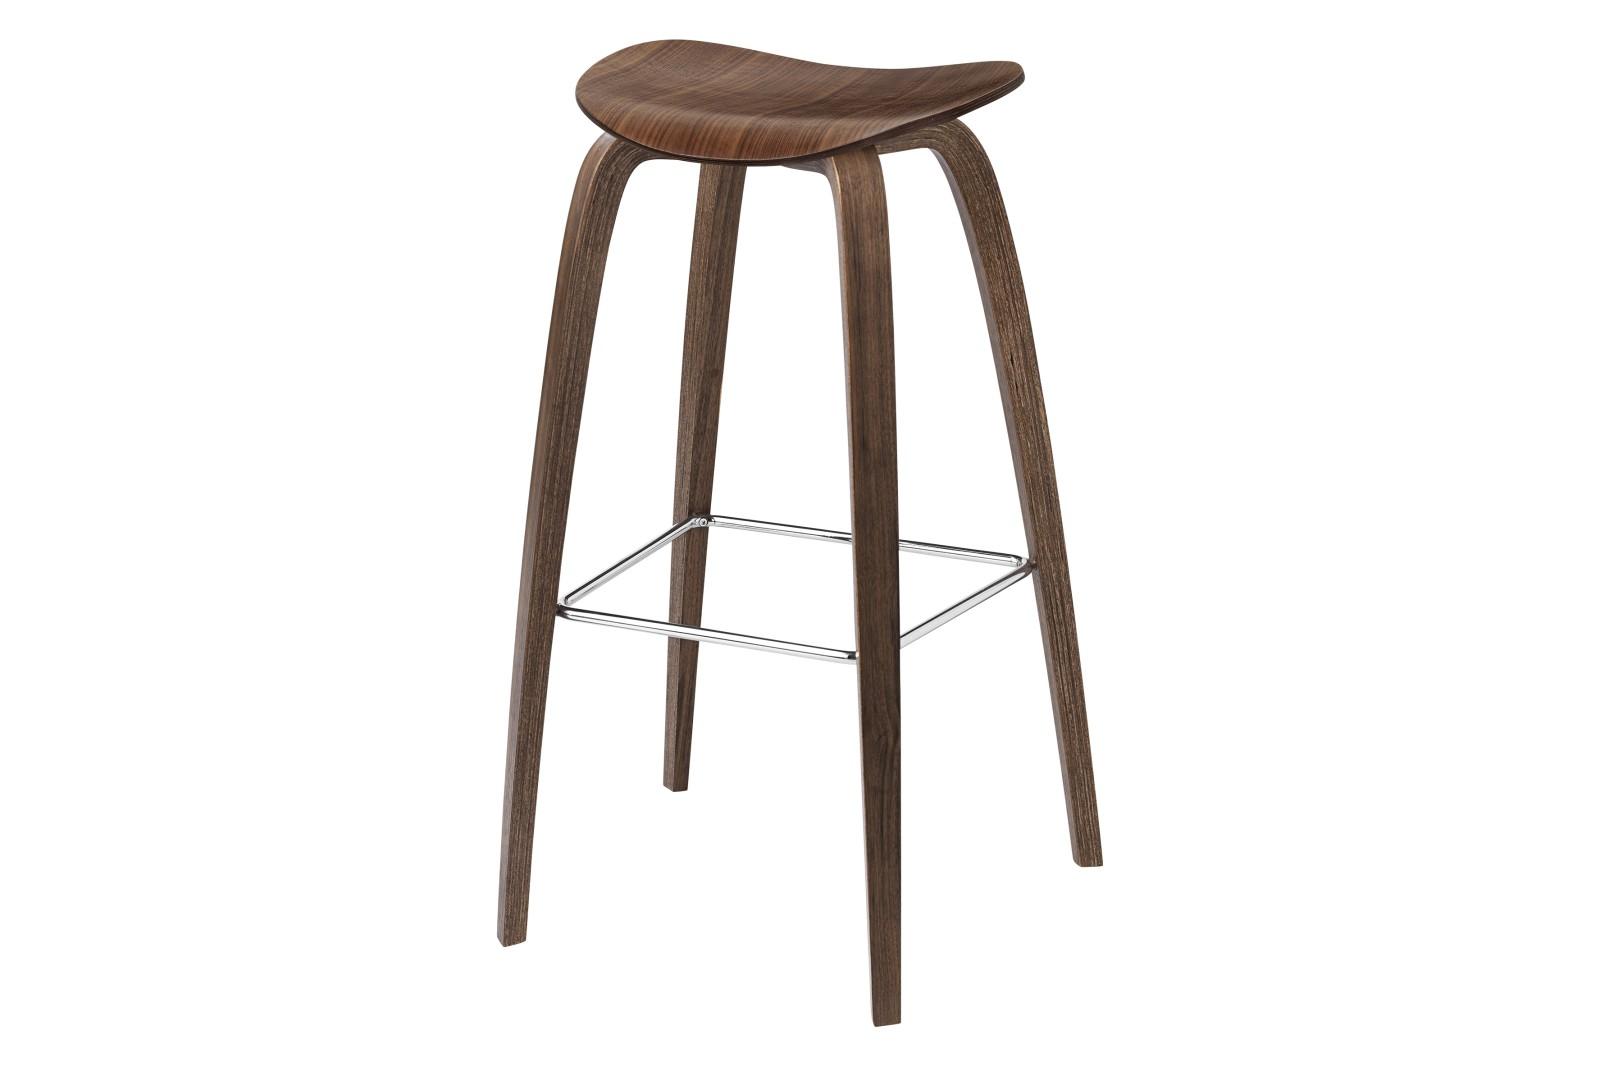 2D Bar Stool - Un-Upholstered, Wood Base Gubi Wood American Walnut, Gubi Metal Chrome, Felt Glides